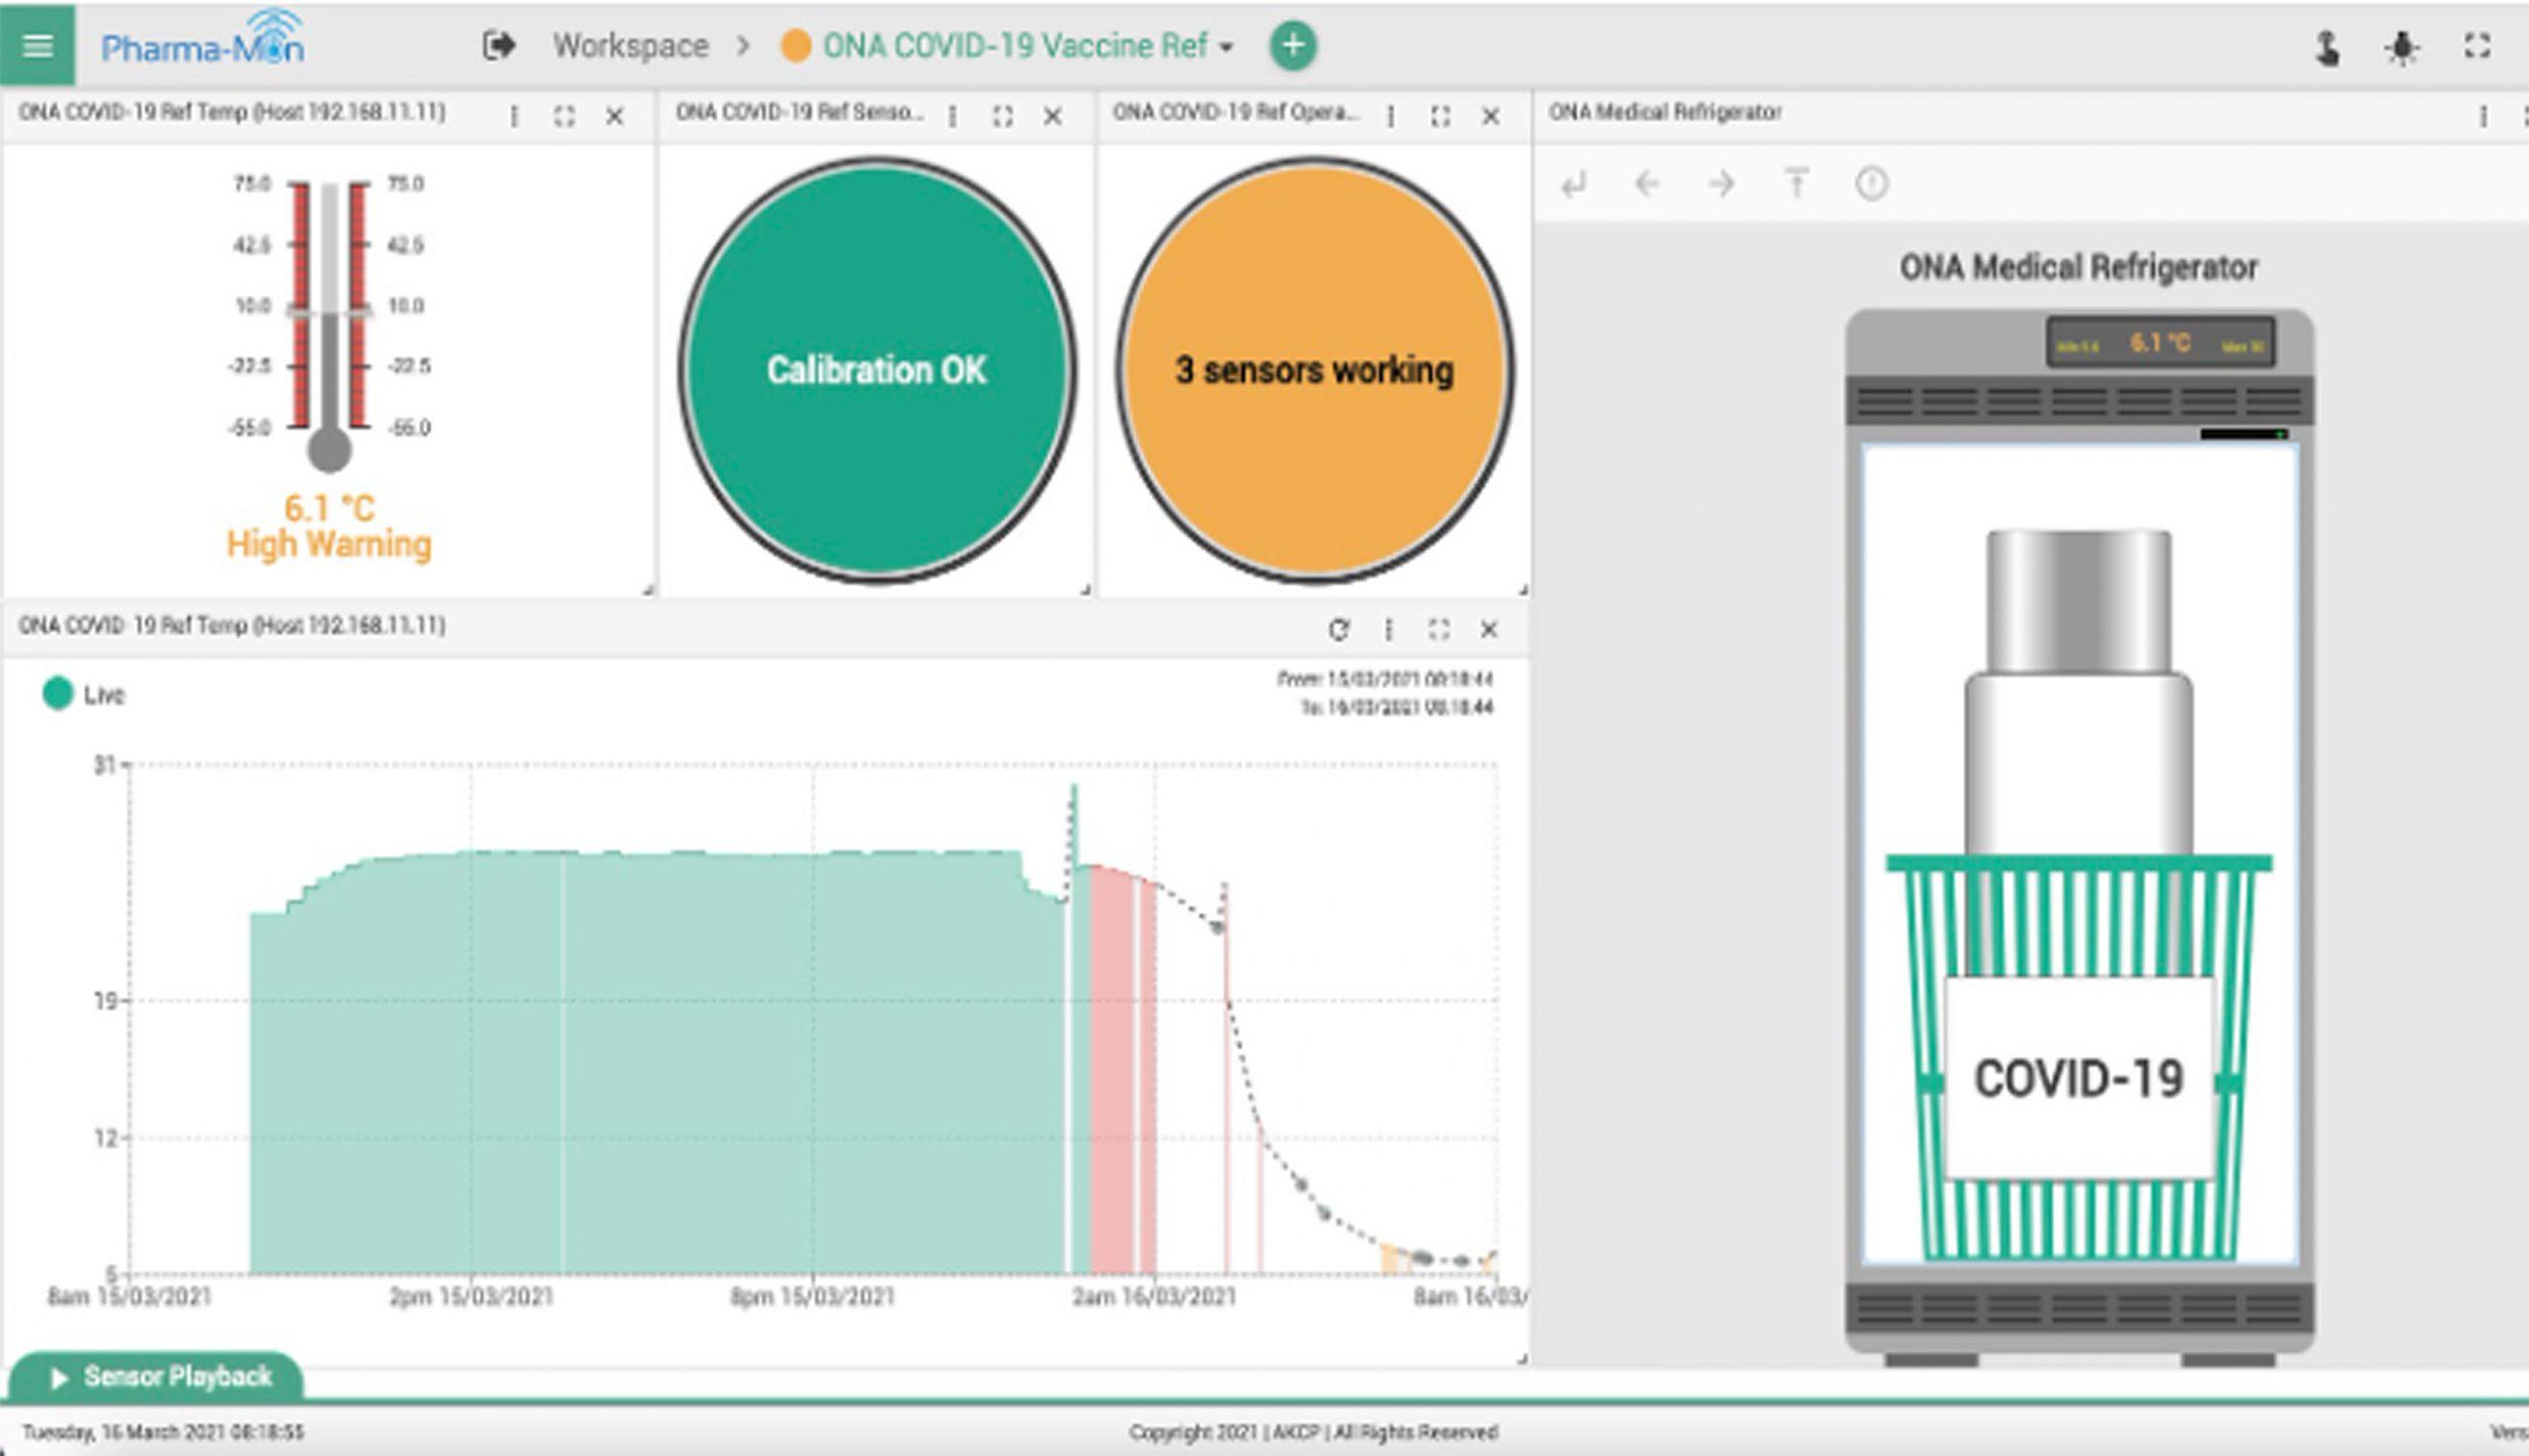 Pharma-Mon Cloud Server interface